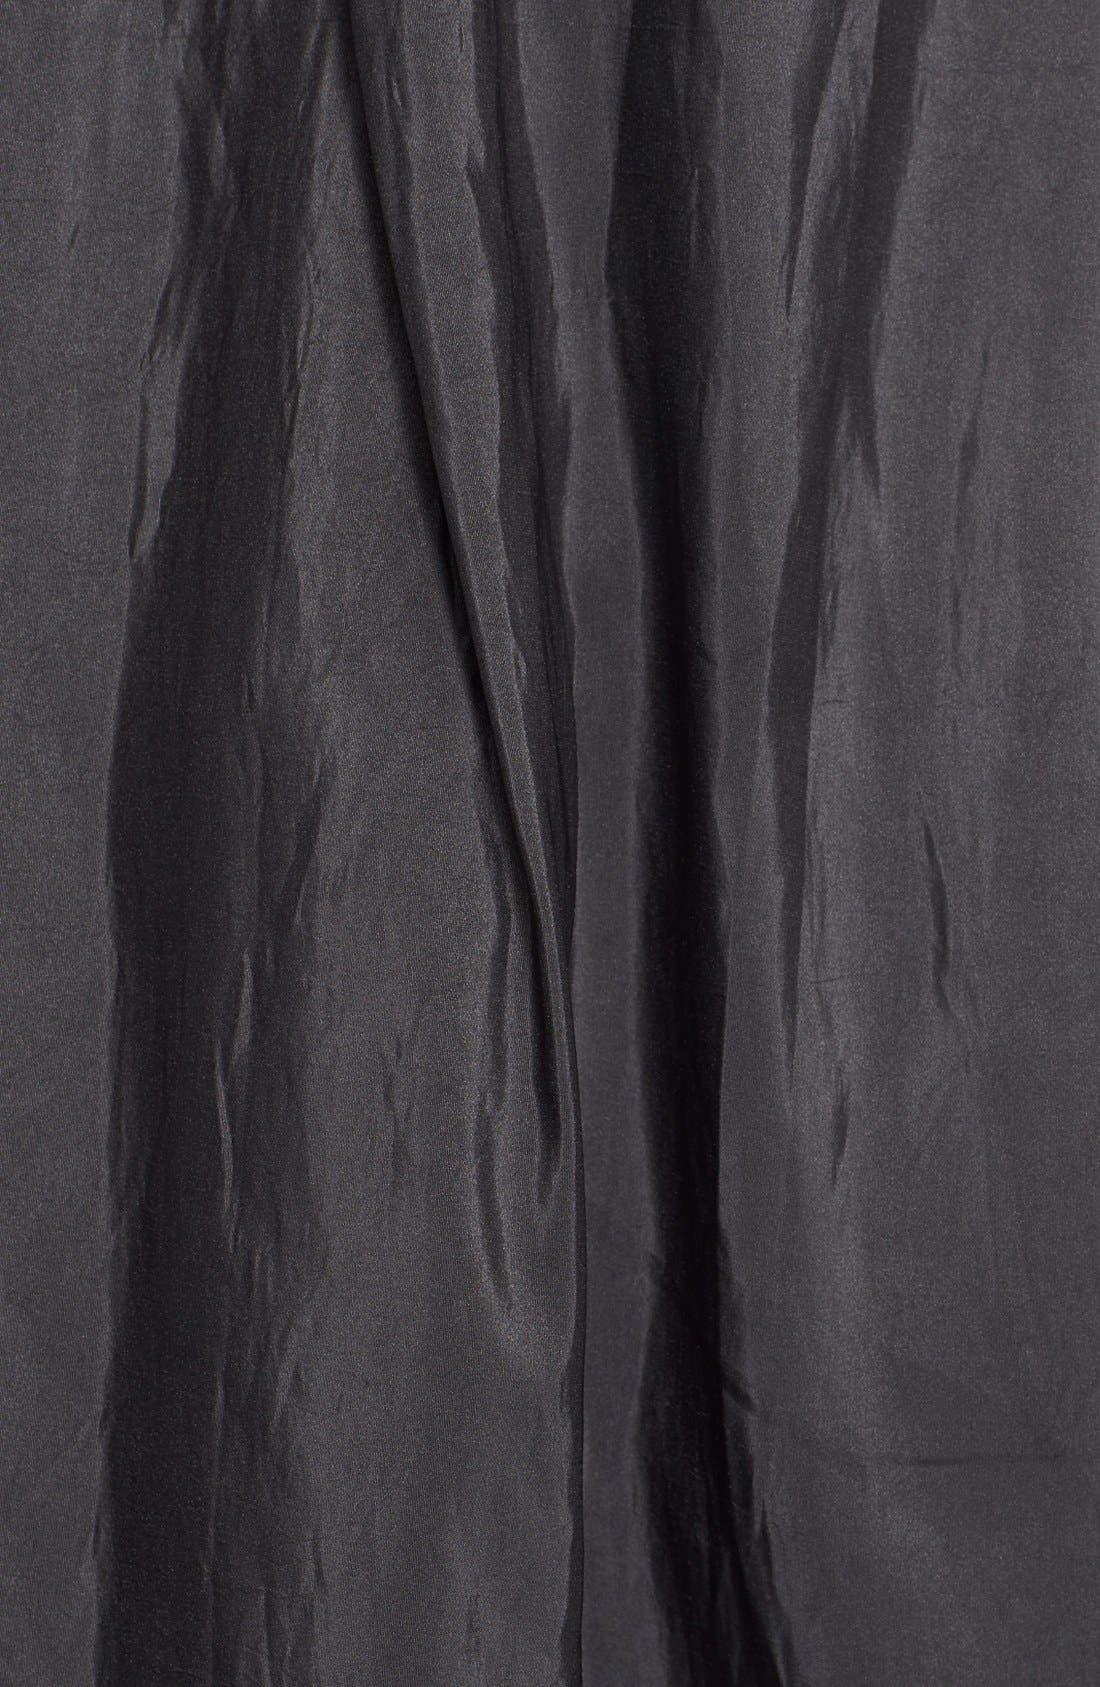 Taffeta Ballgown Skirt,                             Alternate thumbnail 3, color,                             BLACK